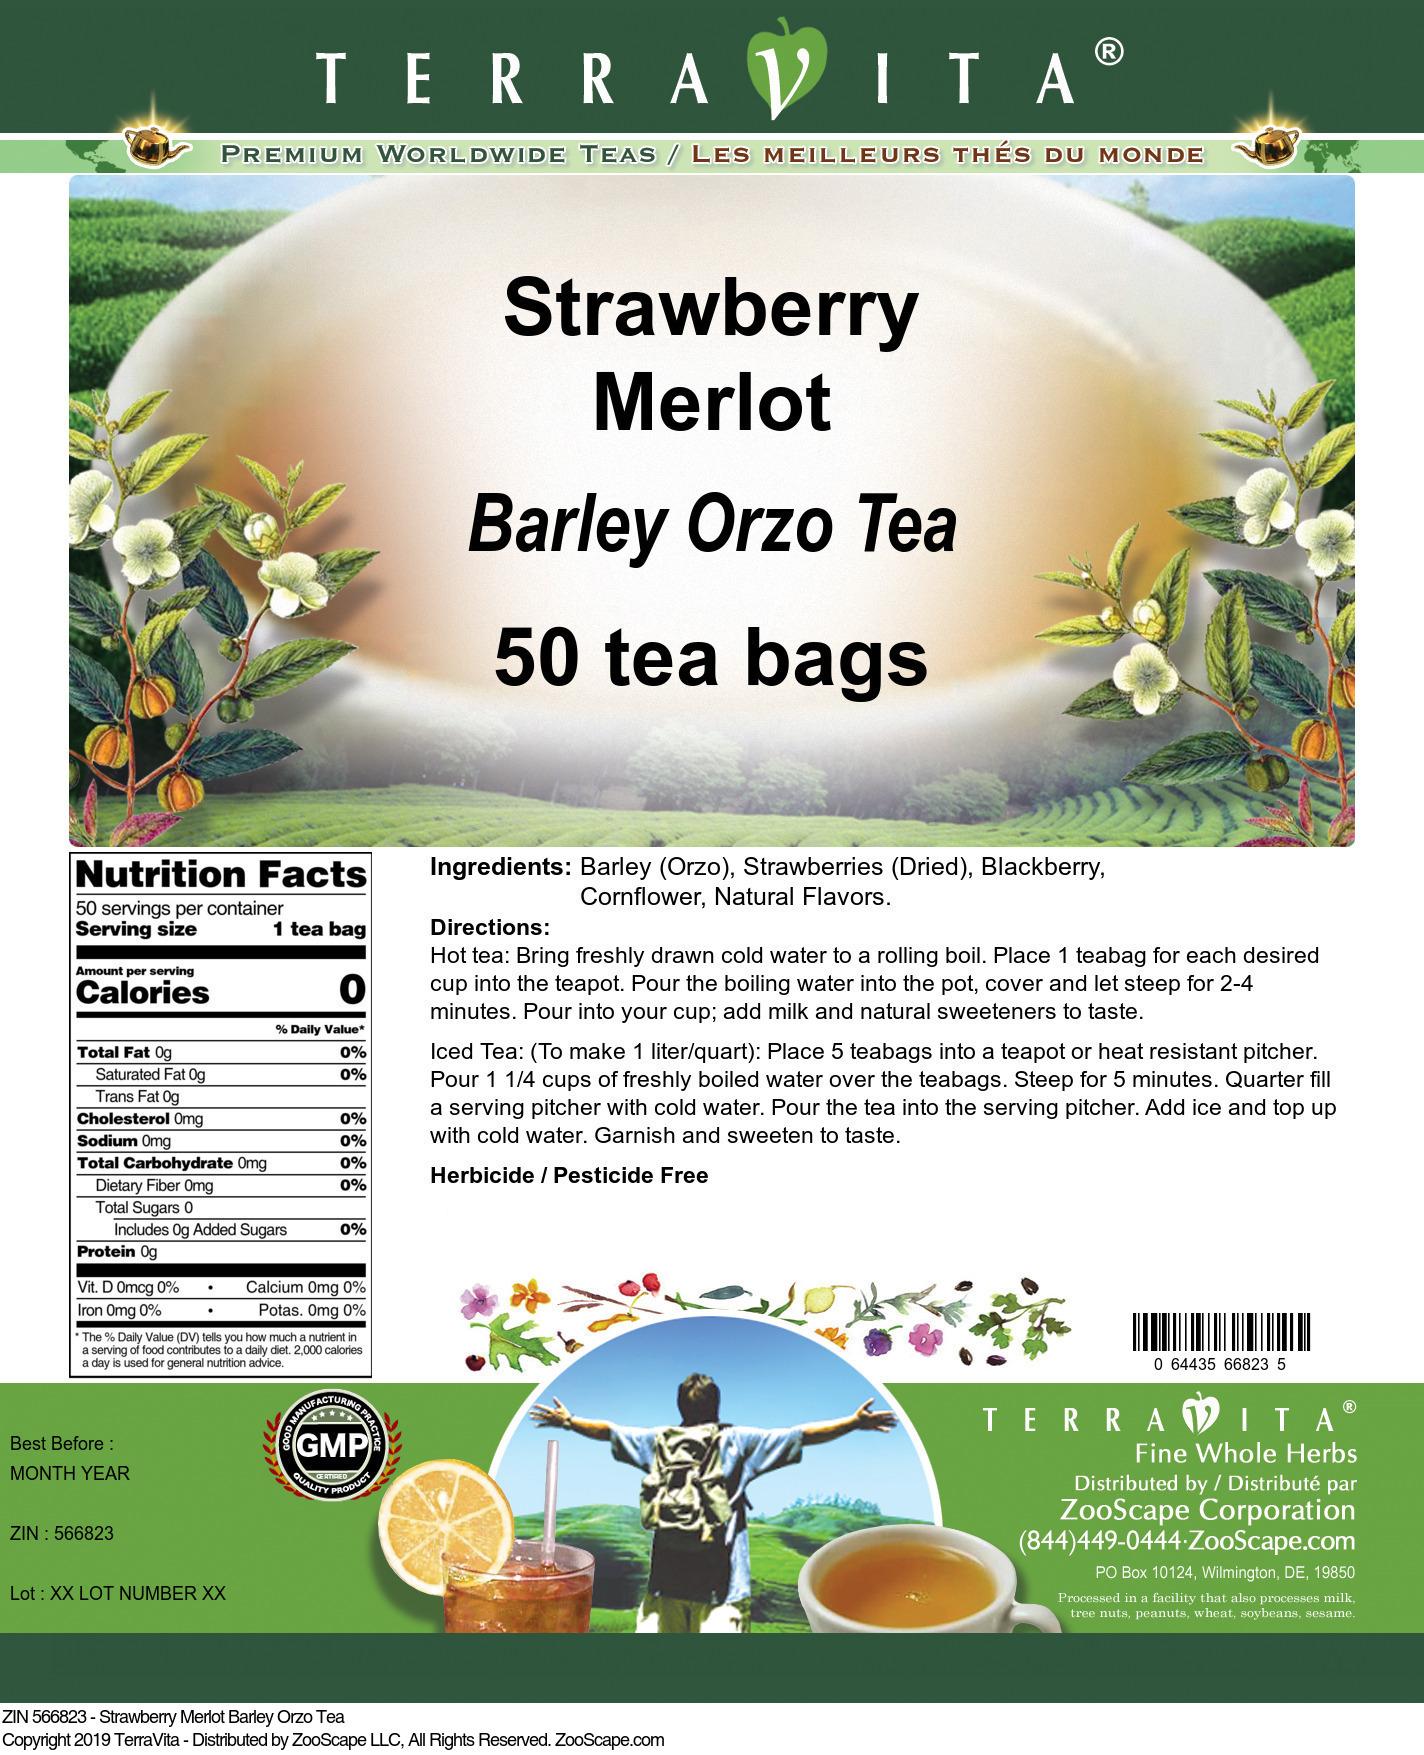 Strawberry Merlot Barley Orzo Tea